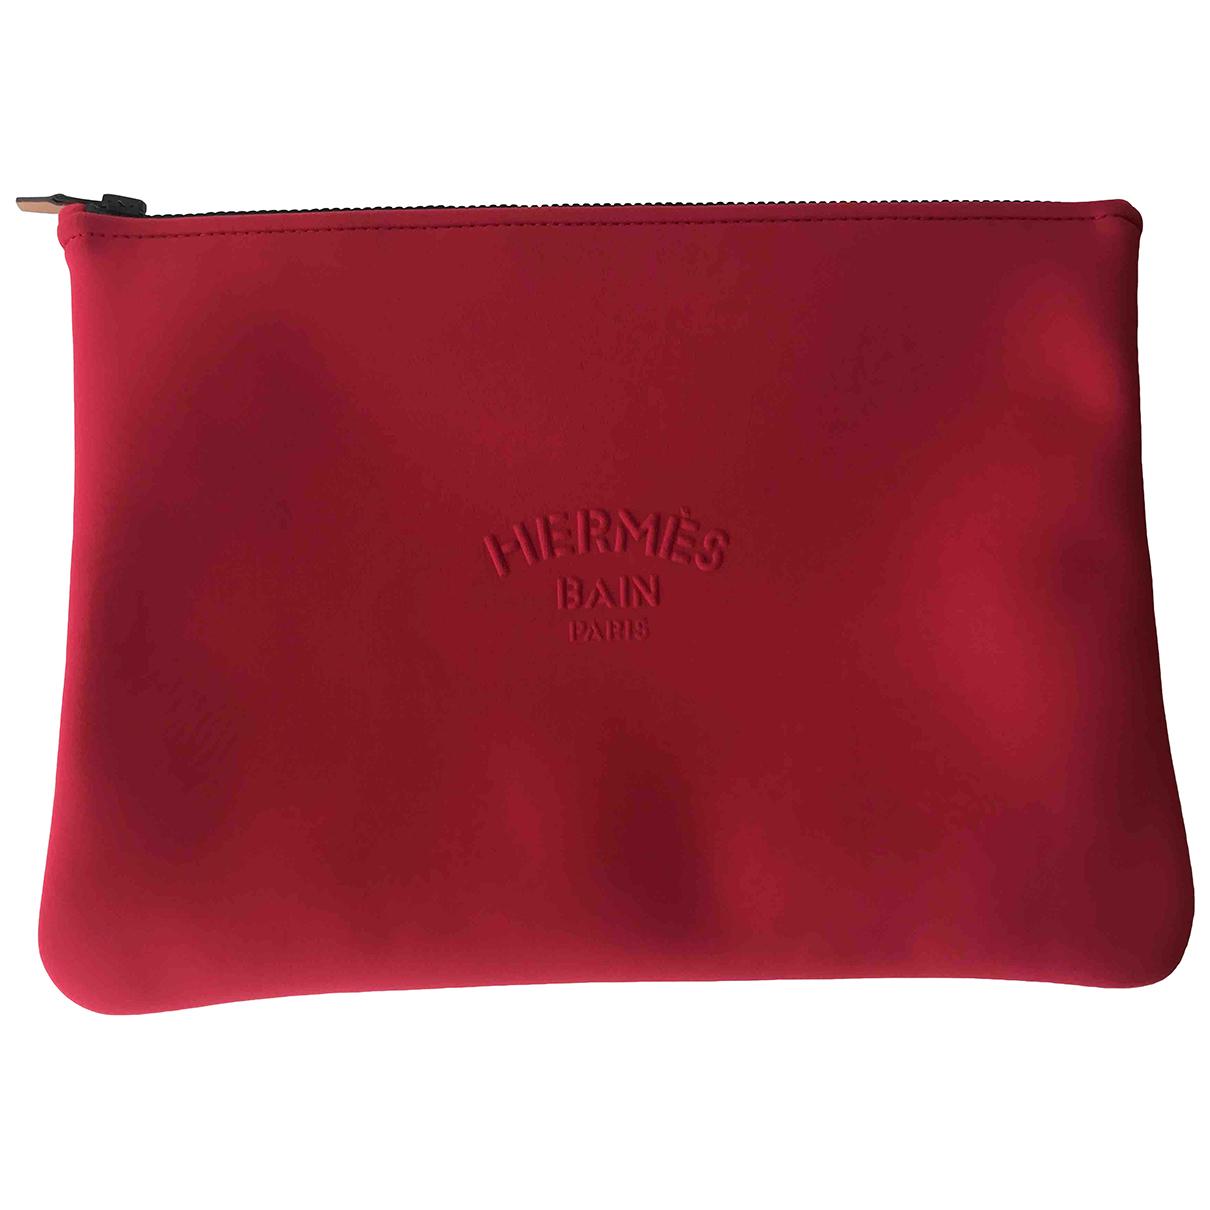 Hermès \N Red Cloth Clutch bag for Women \N